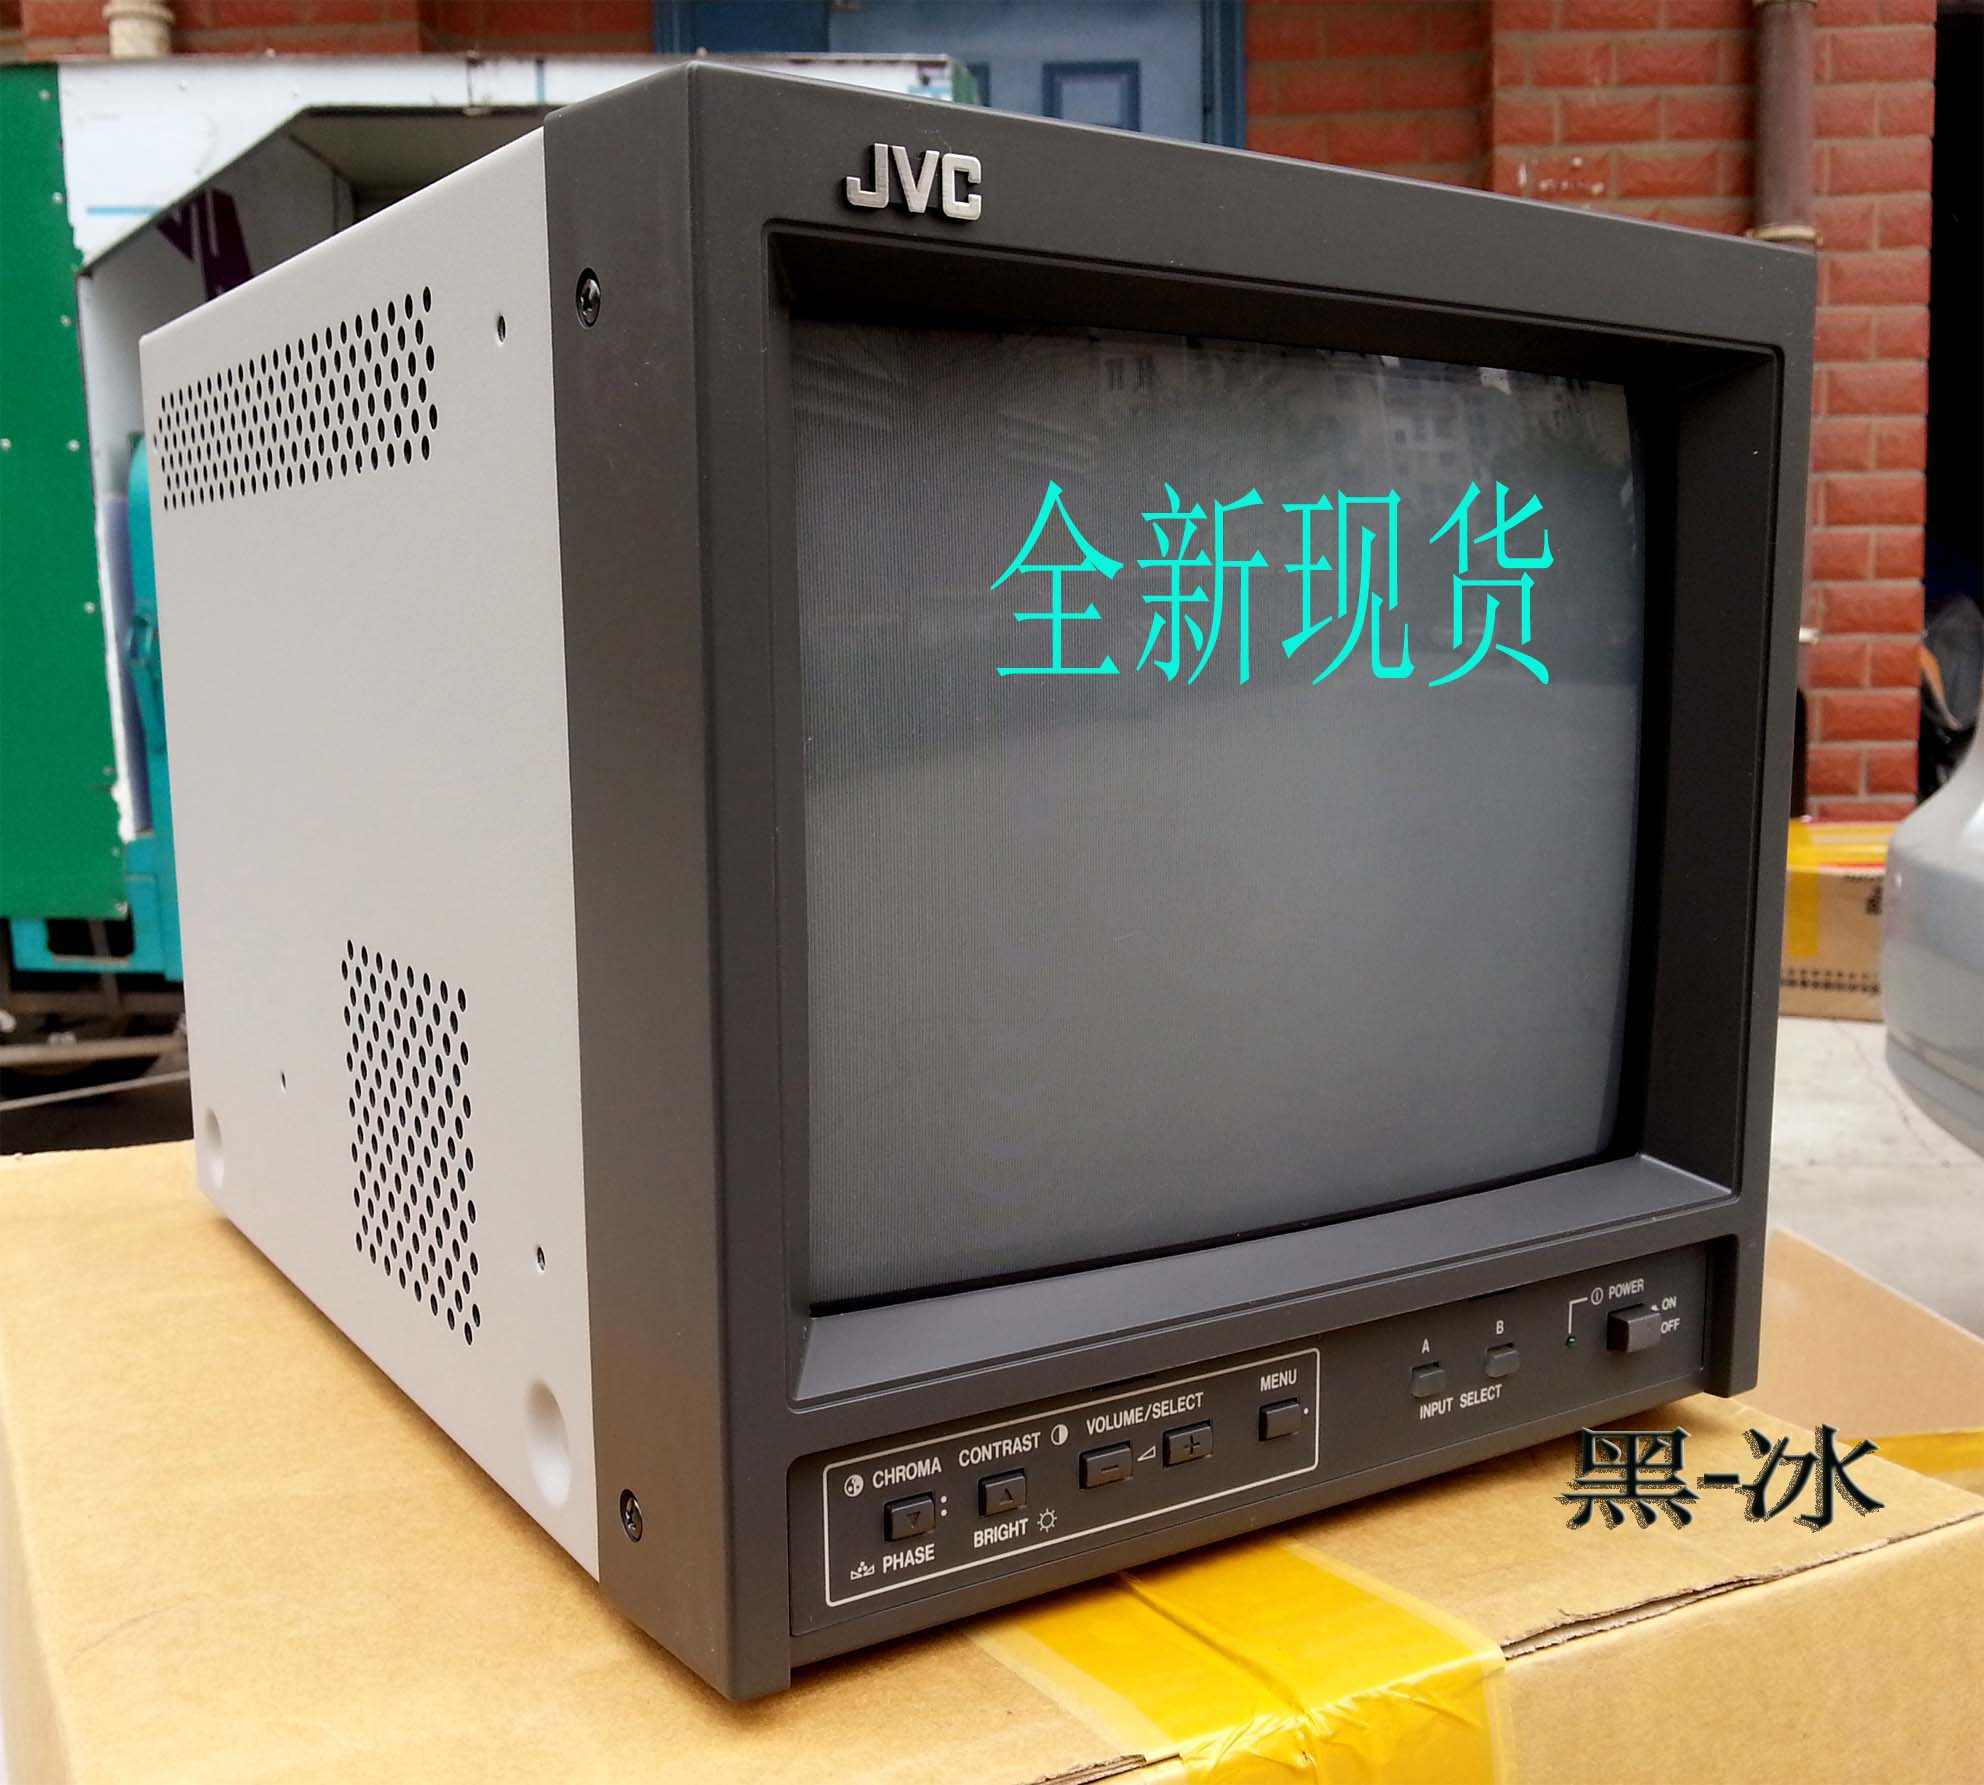 JVC TM-H150CG TM-A101G monitor color monitor